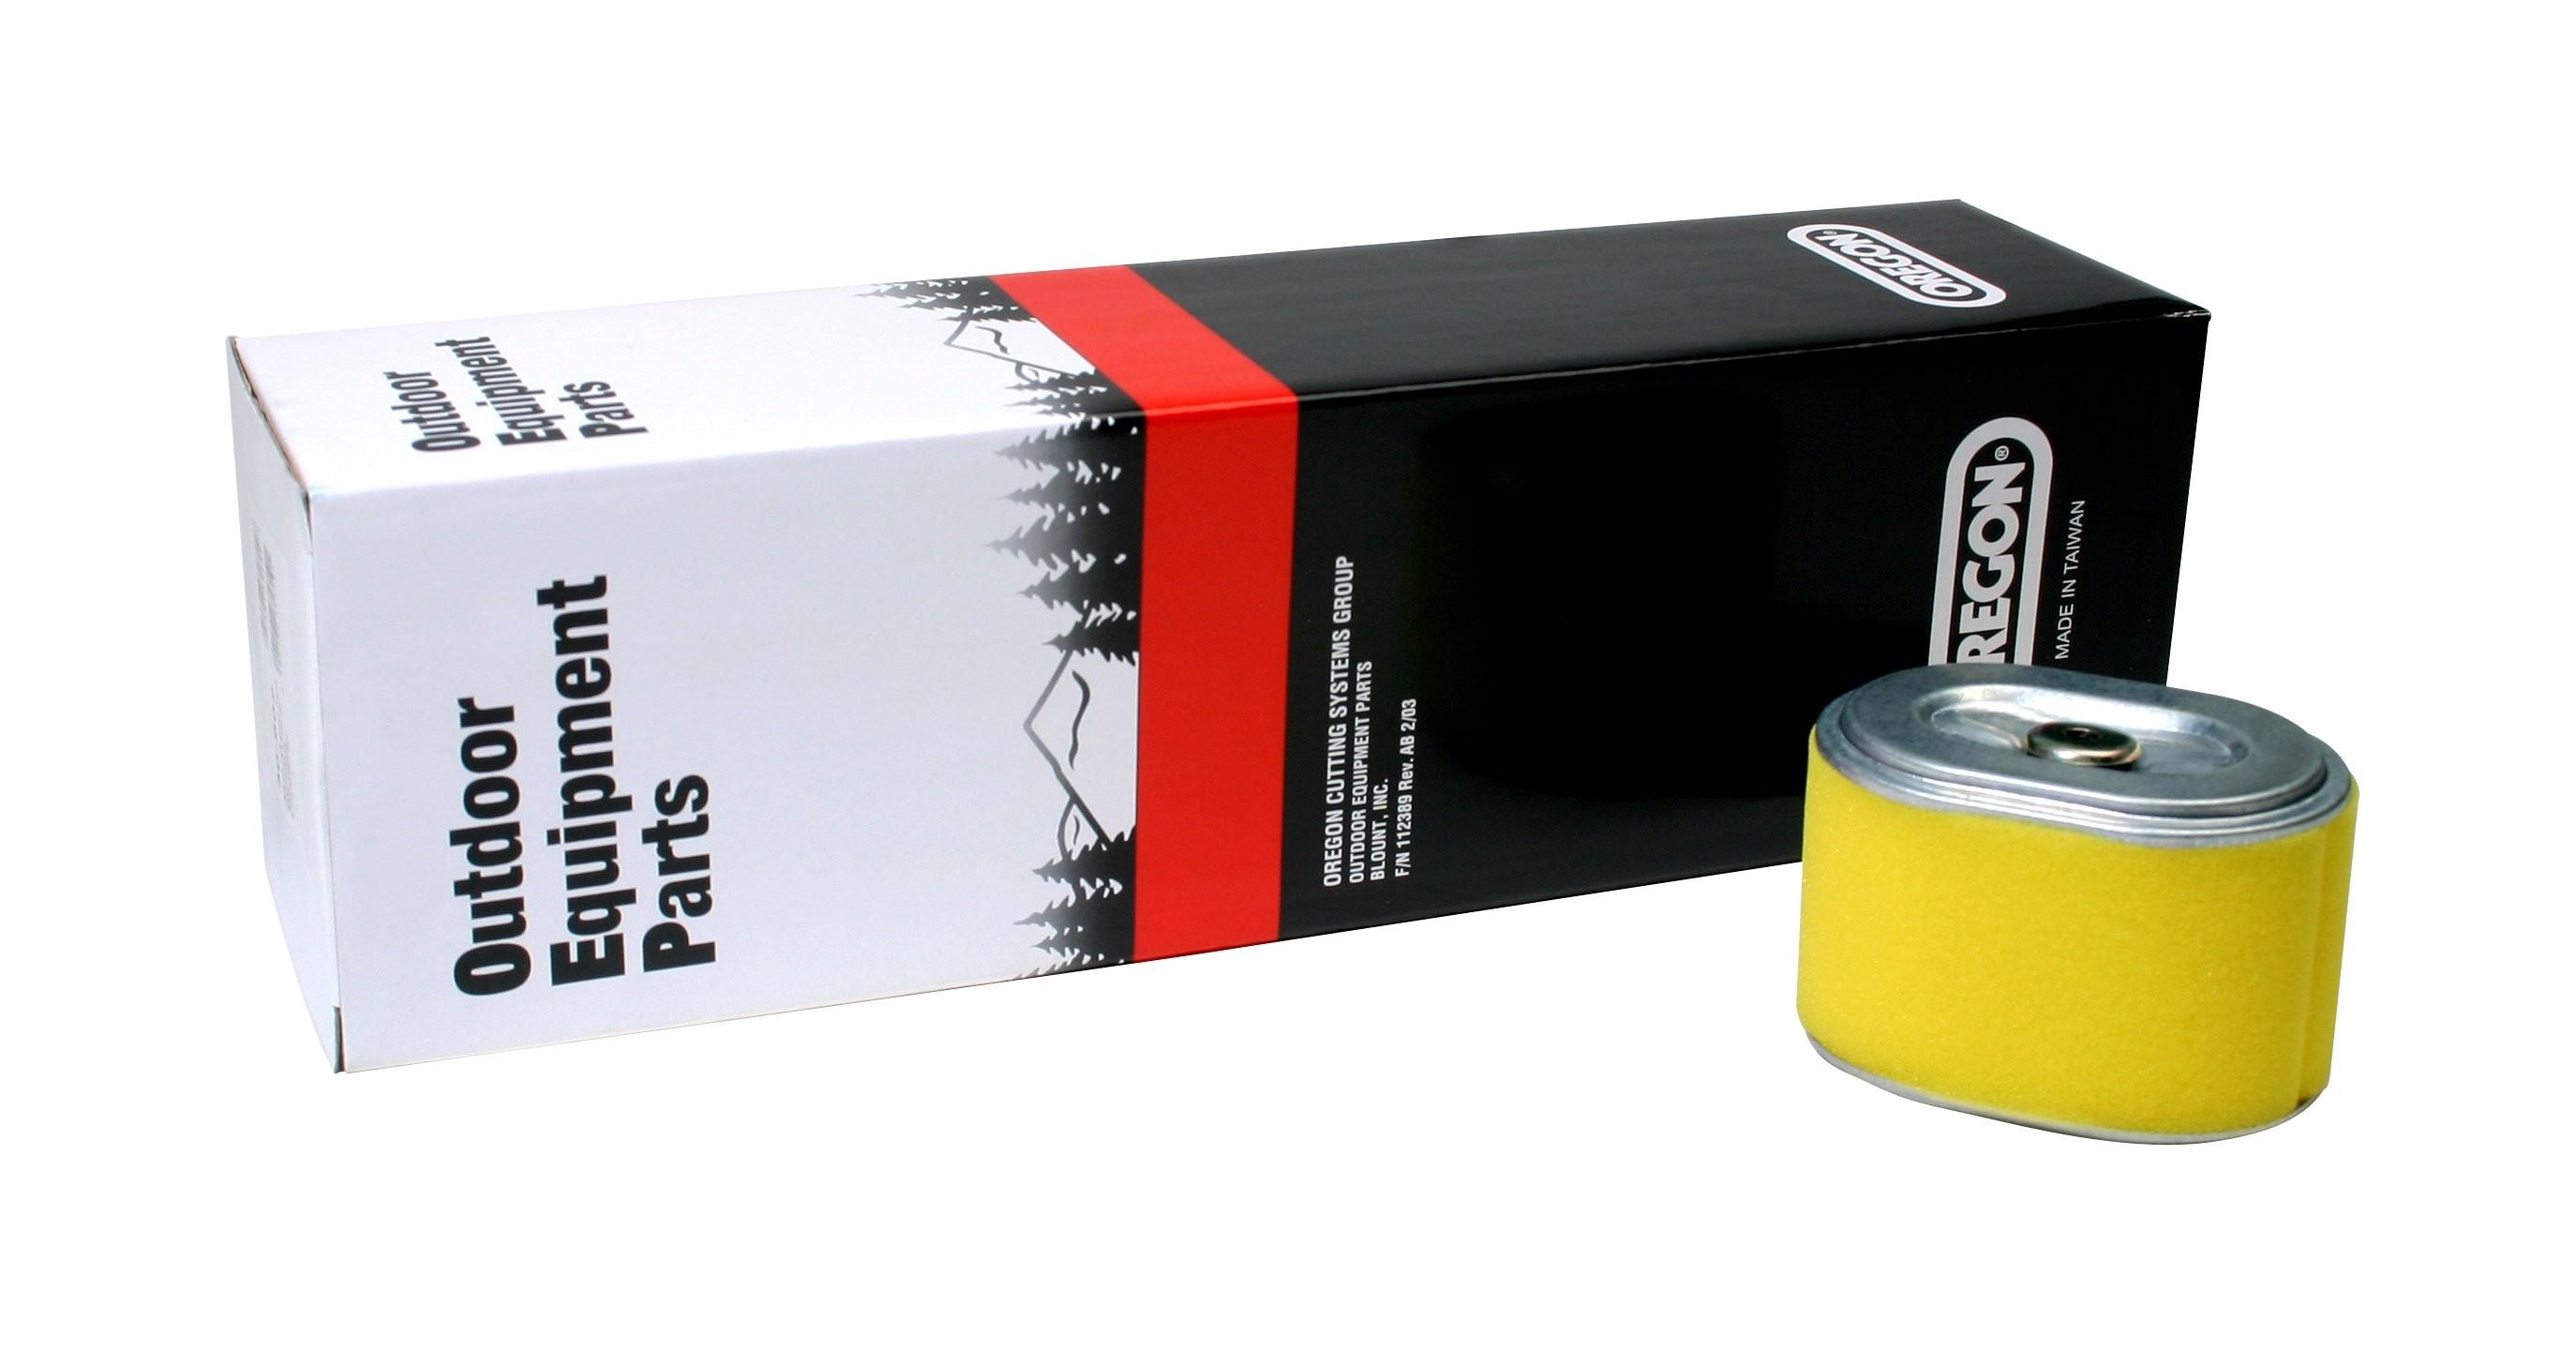 Vzduchový filtr do sekačky s motorem Honda GX140 GX160 GX200 - 5 sztuk